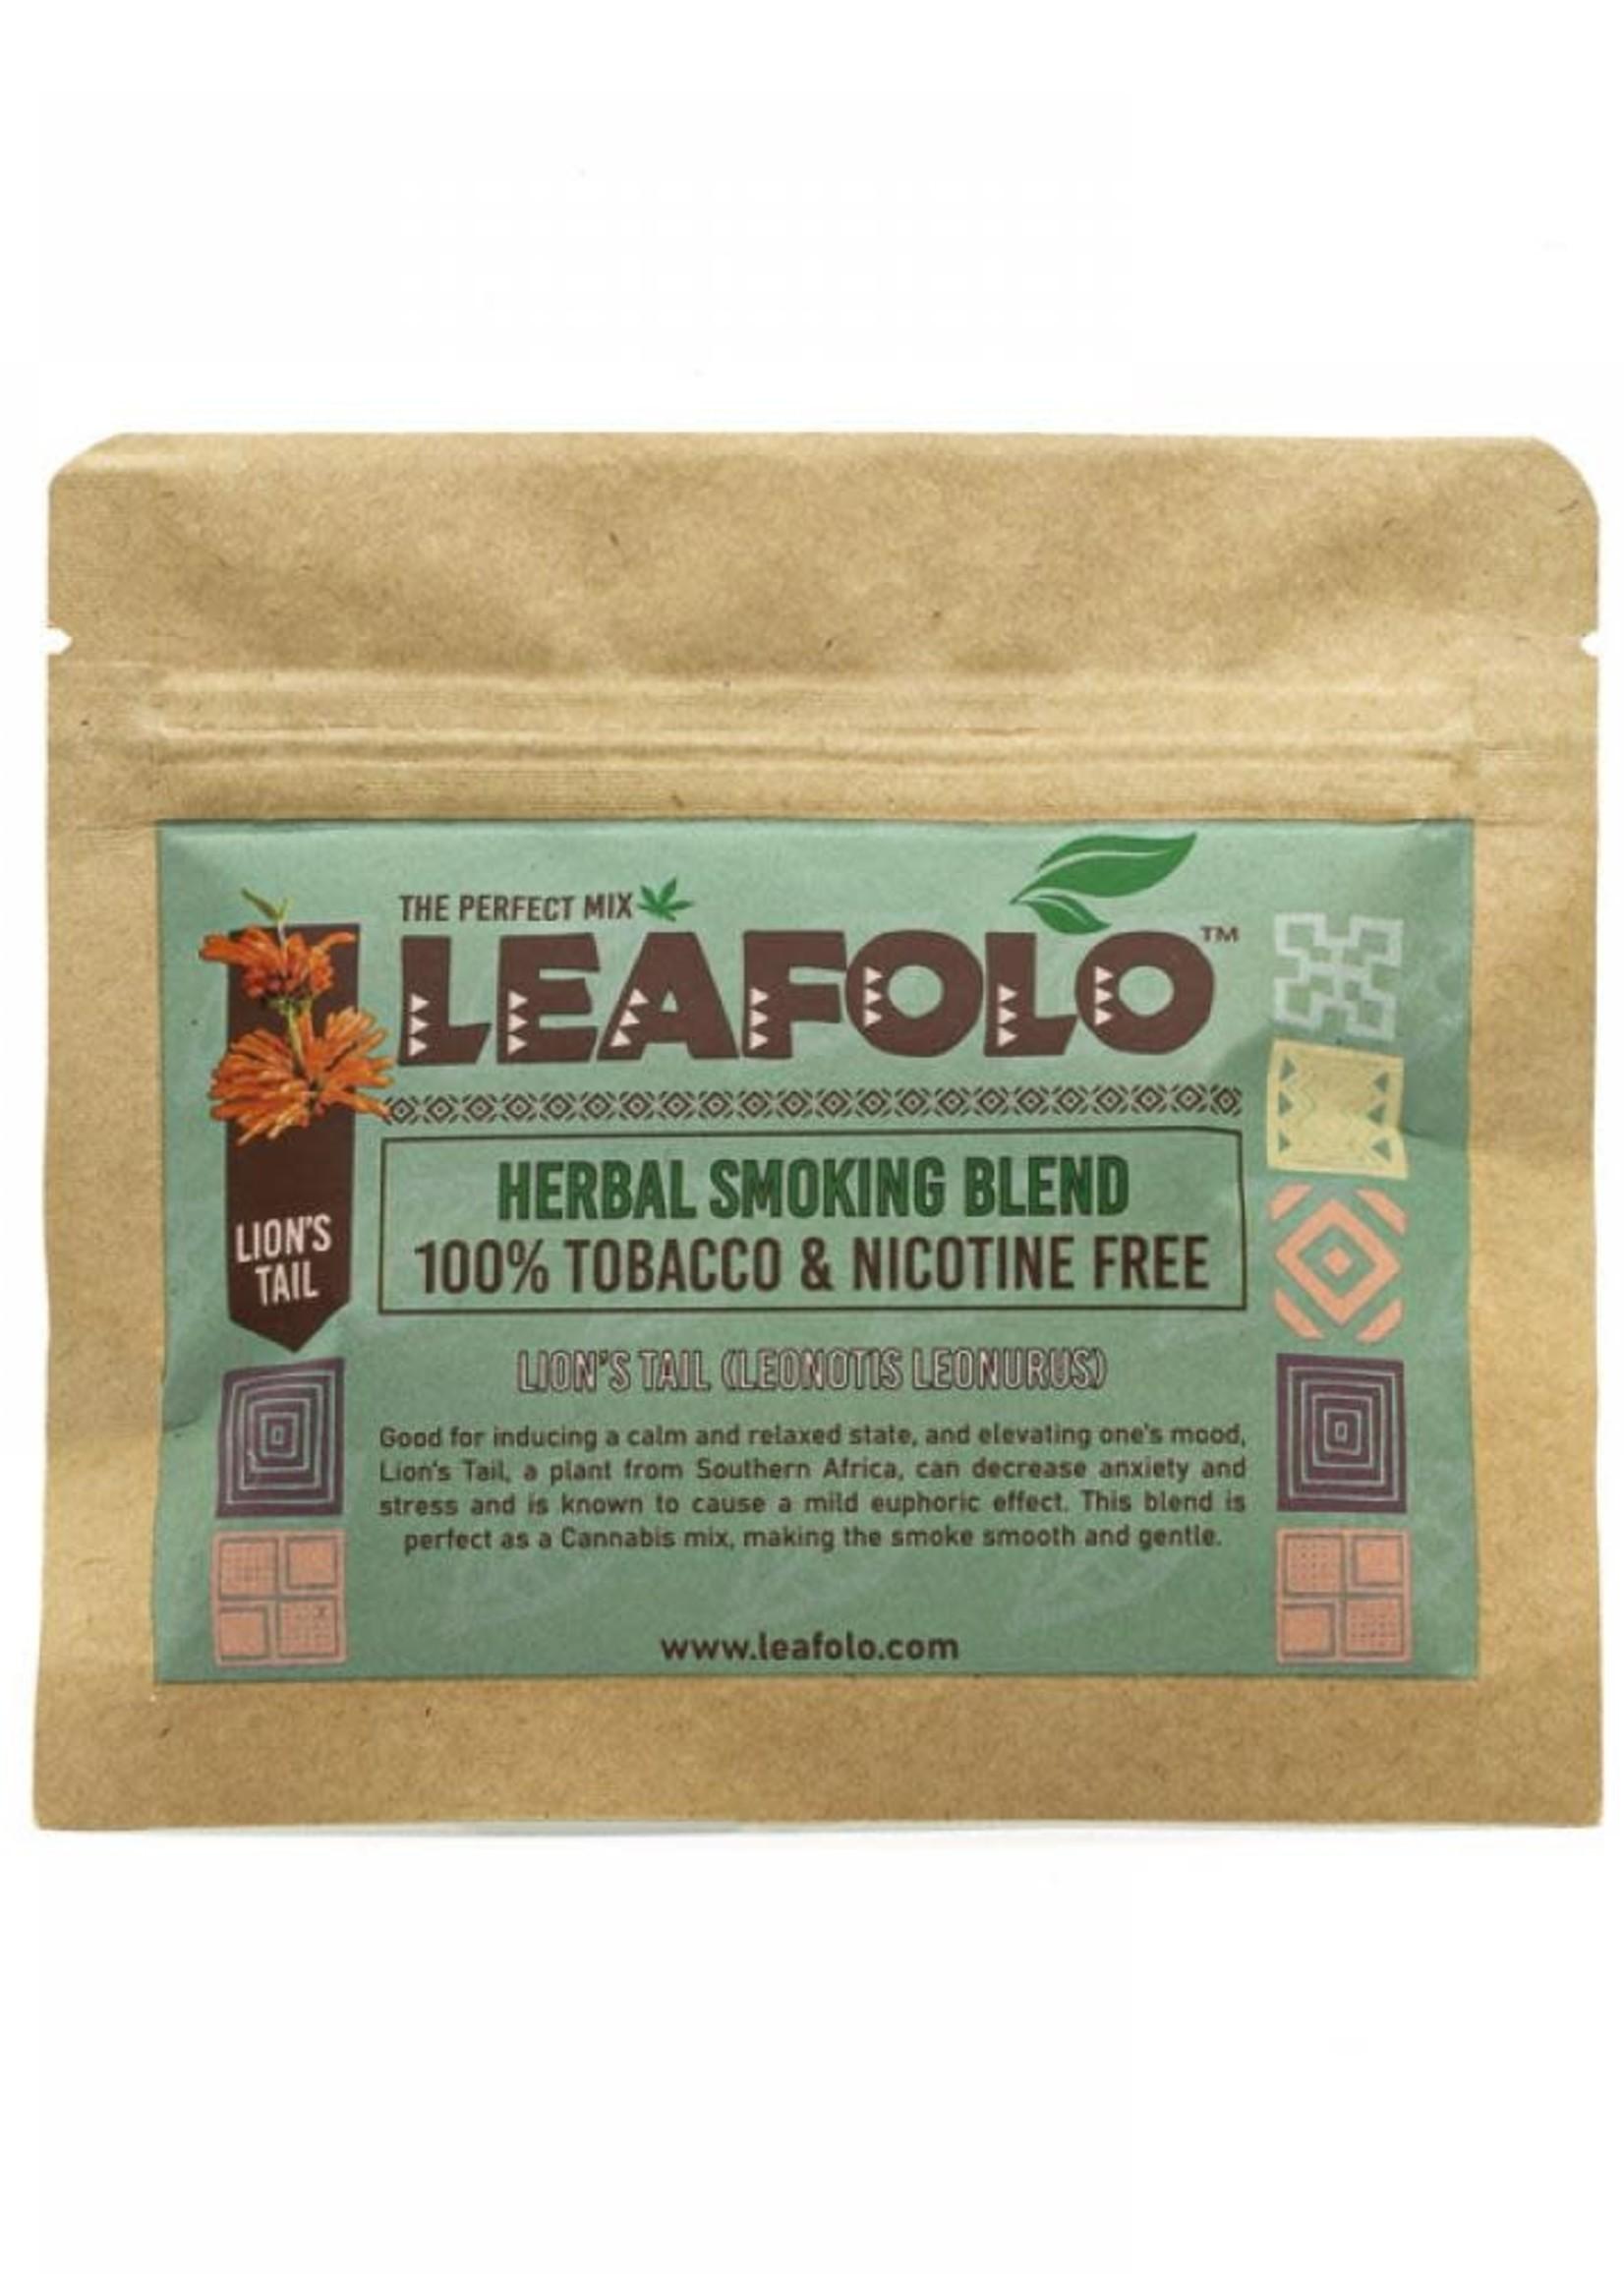 Leafolo - Herbal smoking blend